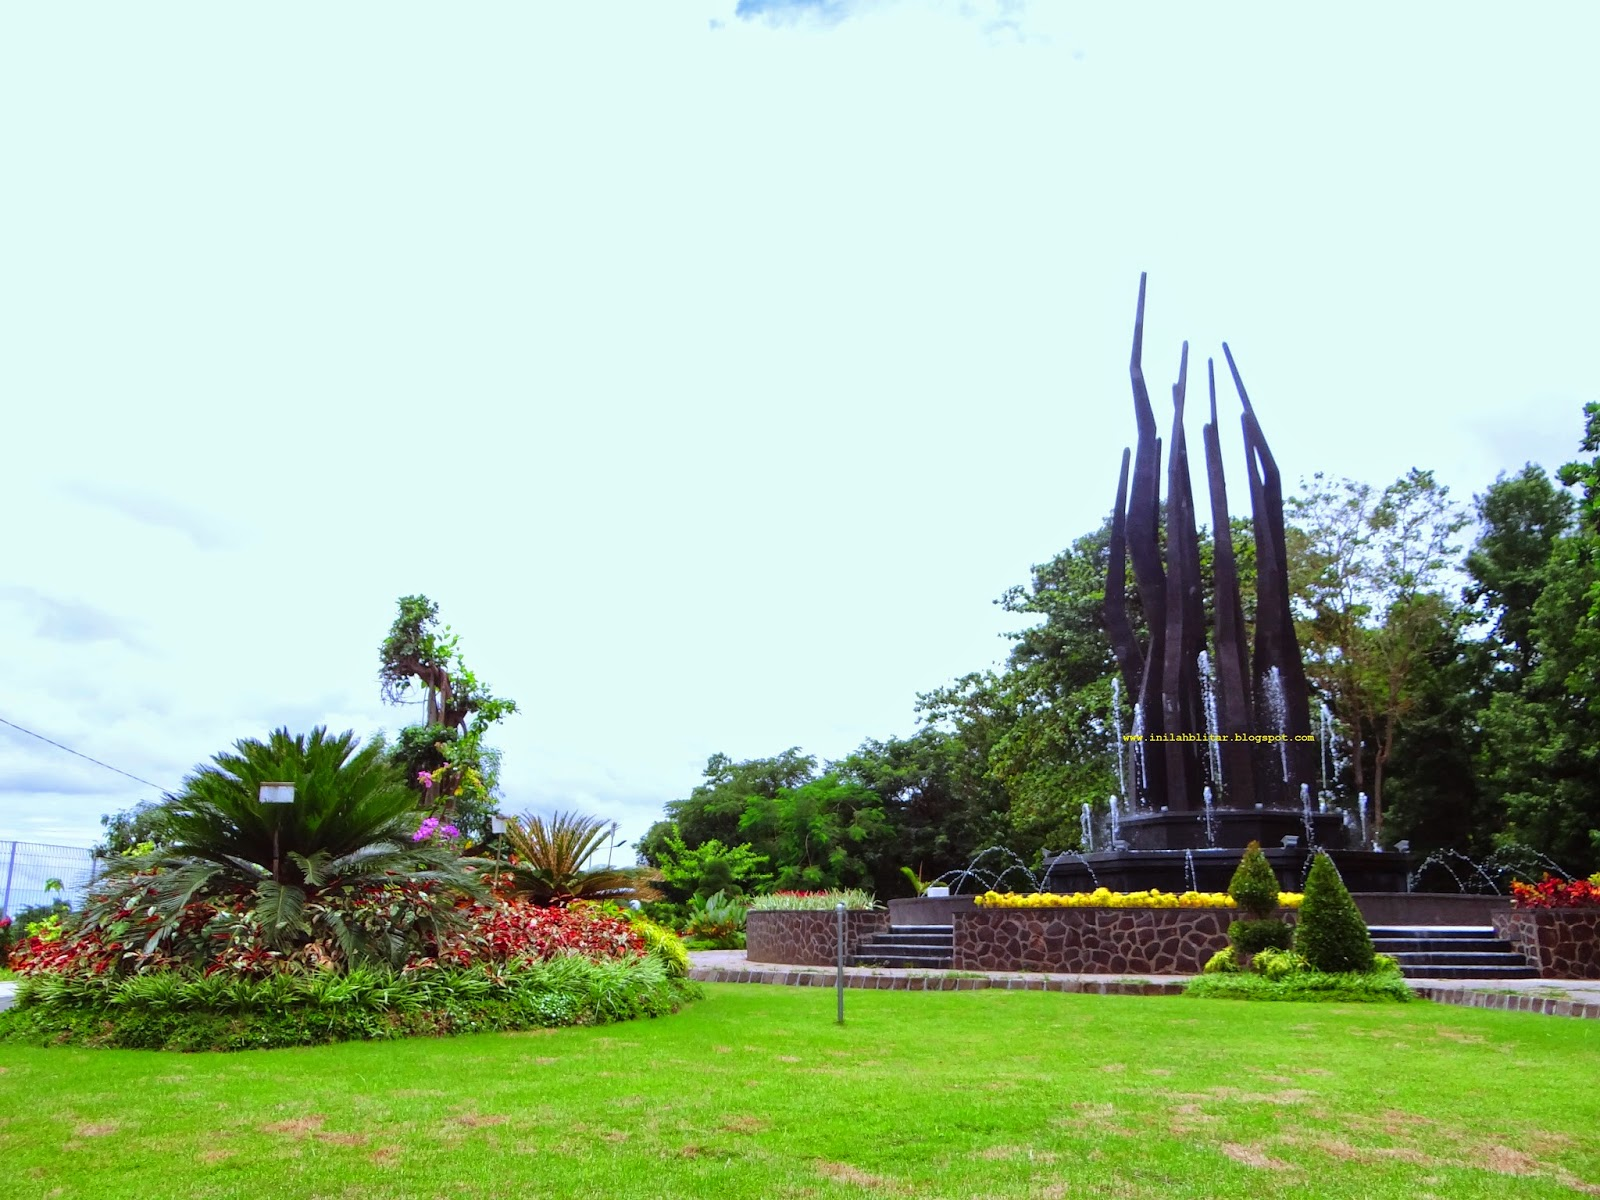 Blitar Insomnia Taman Idaman Hati Kamis 12 Mei 2016 Hijau